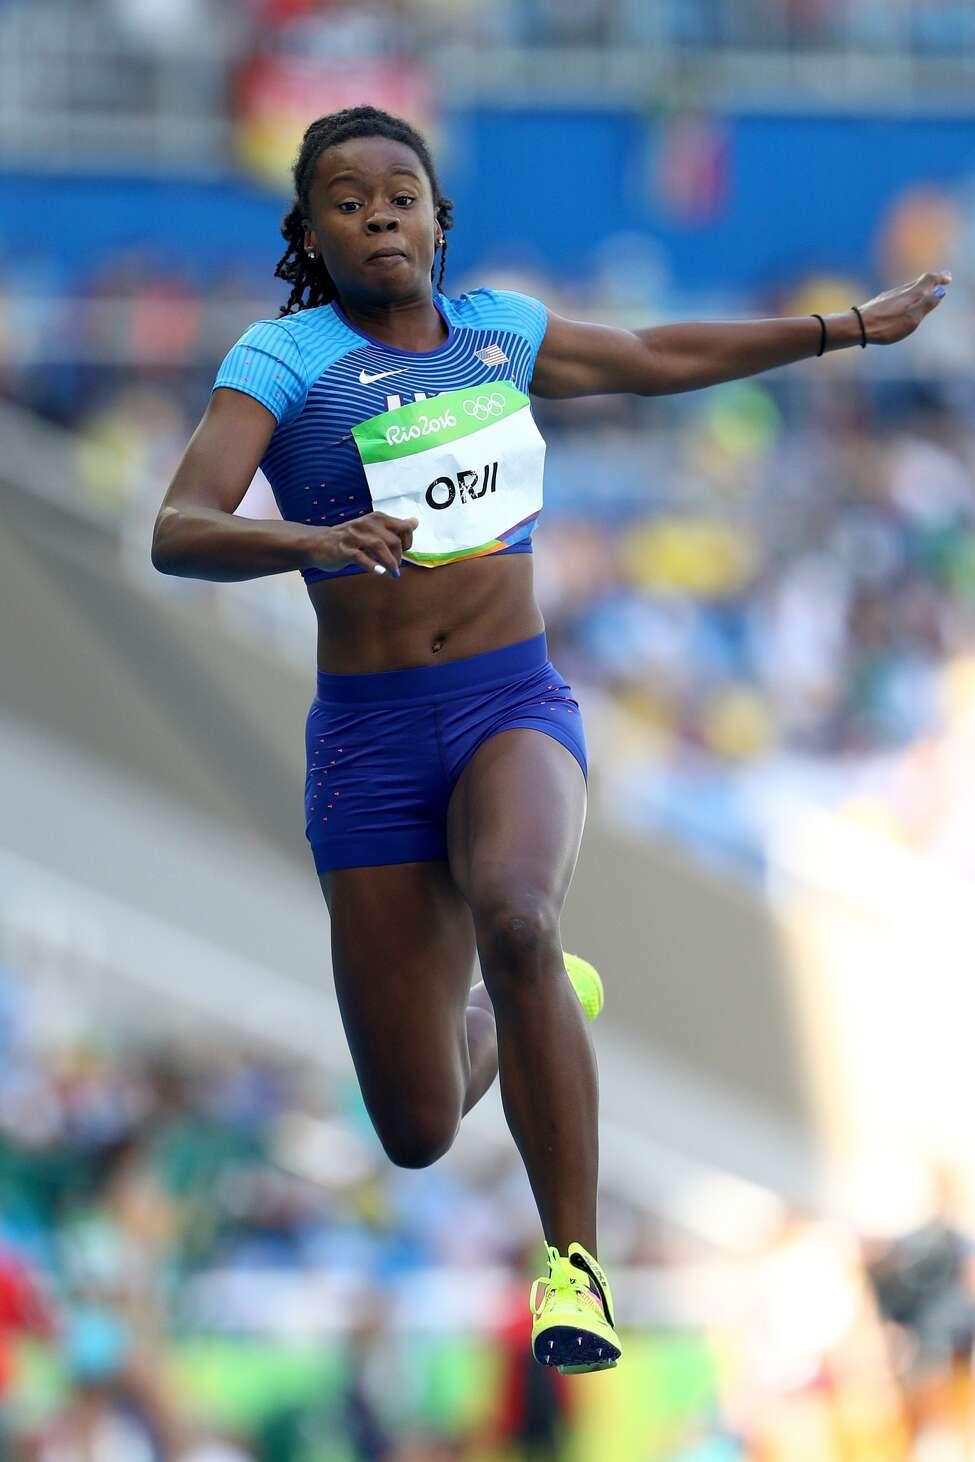 Keturah Orji won gold in the women's triple jump Sunday, Aug. 13, 2016.